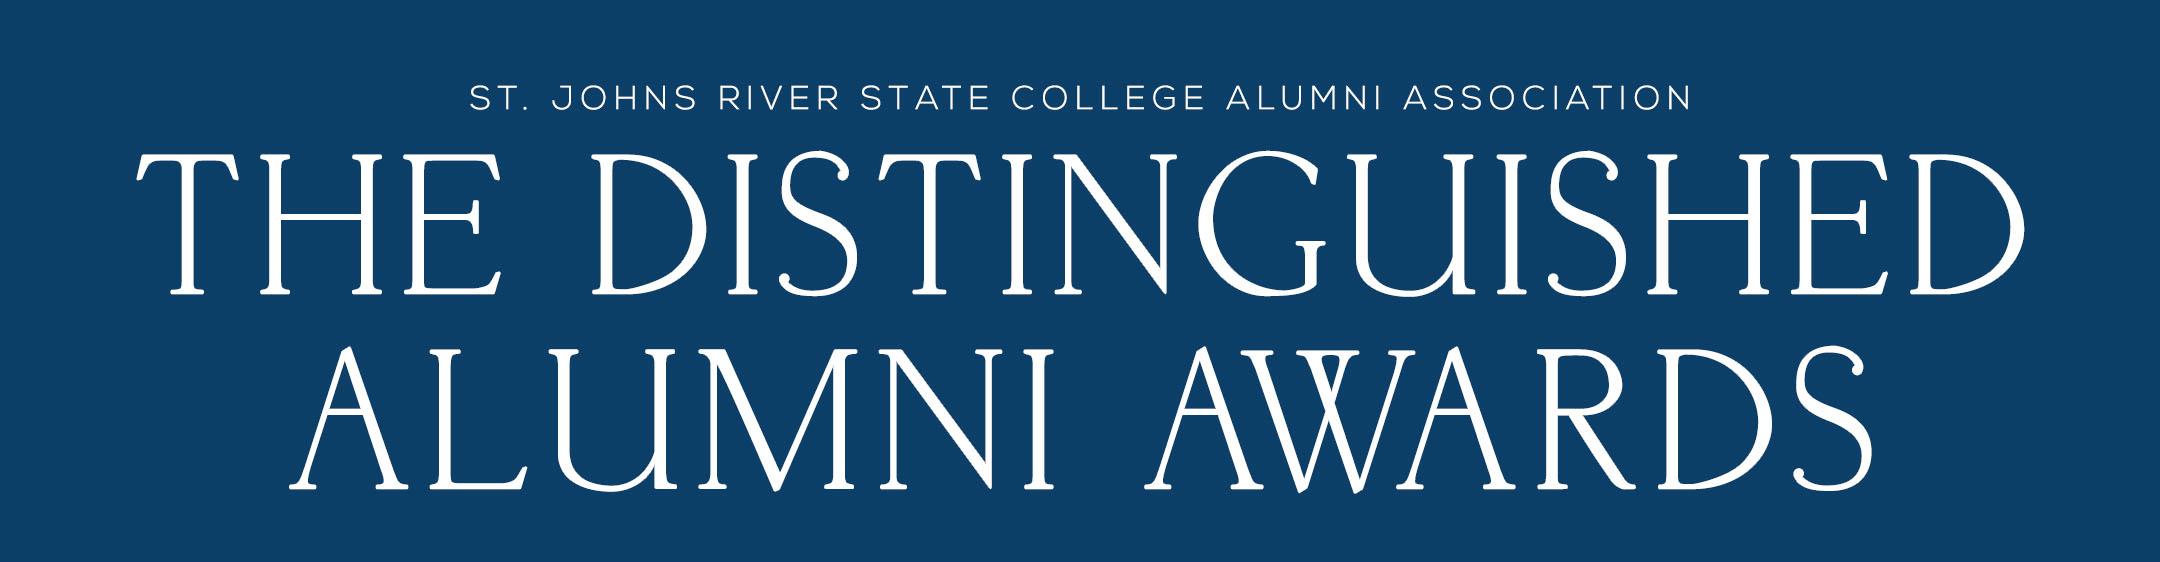 The St. Johns River State College Alumni Association The Distinguished Alumni Awards banner